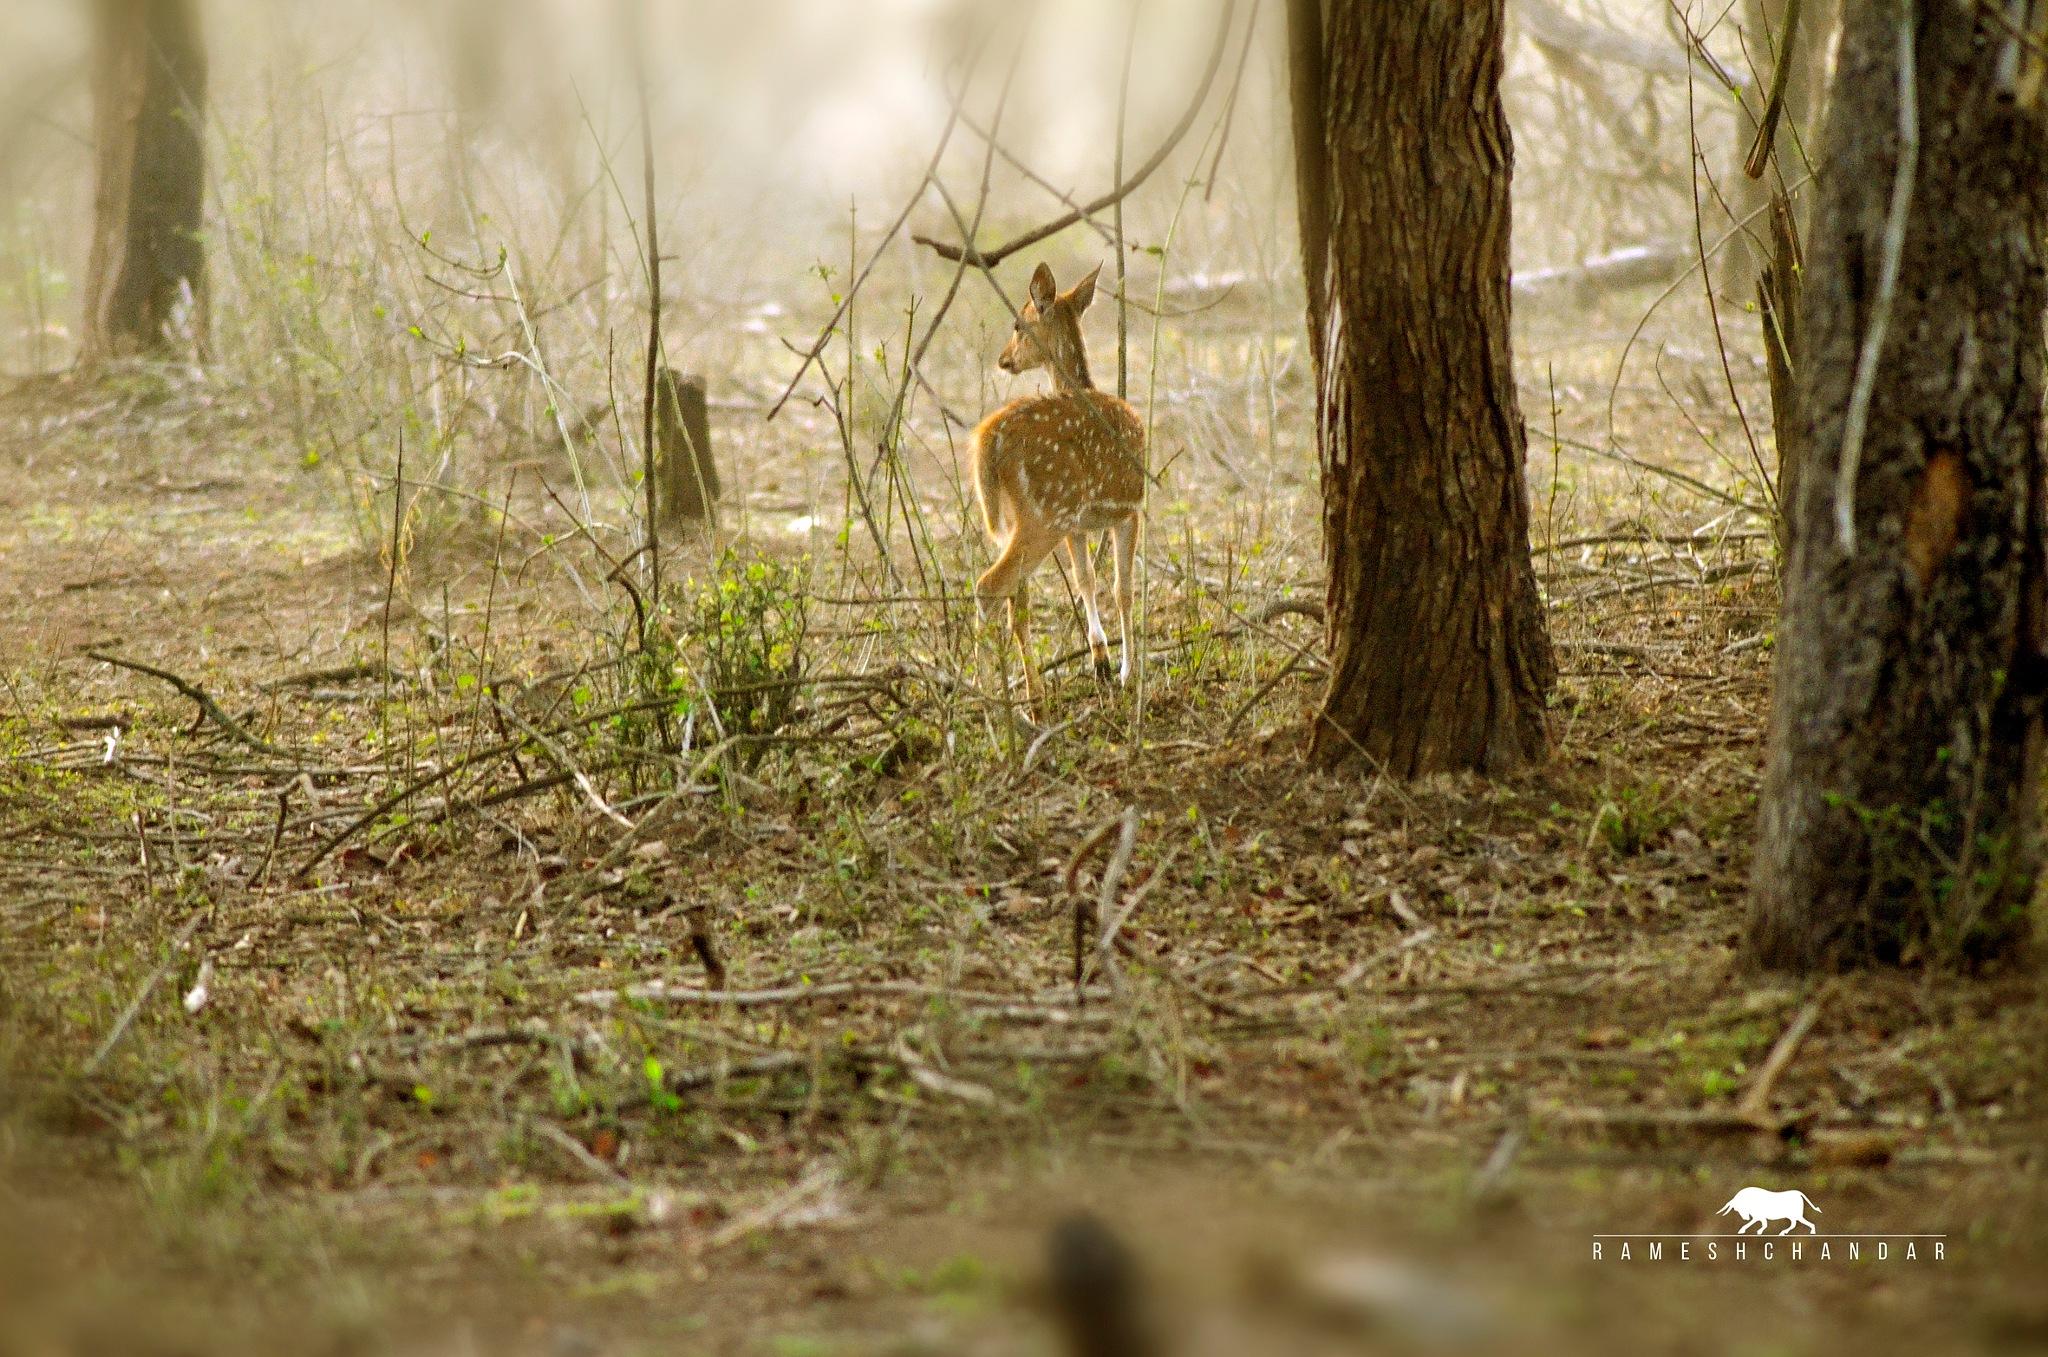 Spotted Deer by rameshchandarr